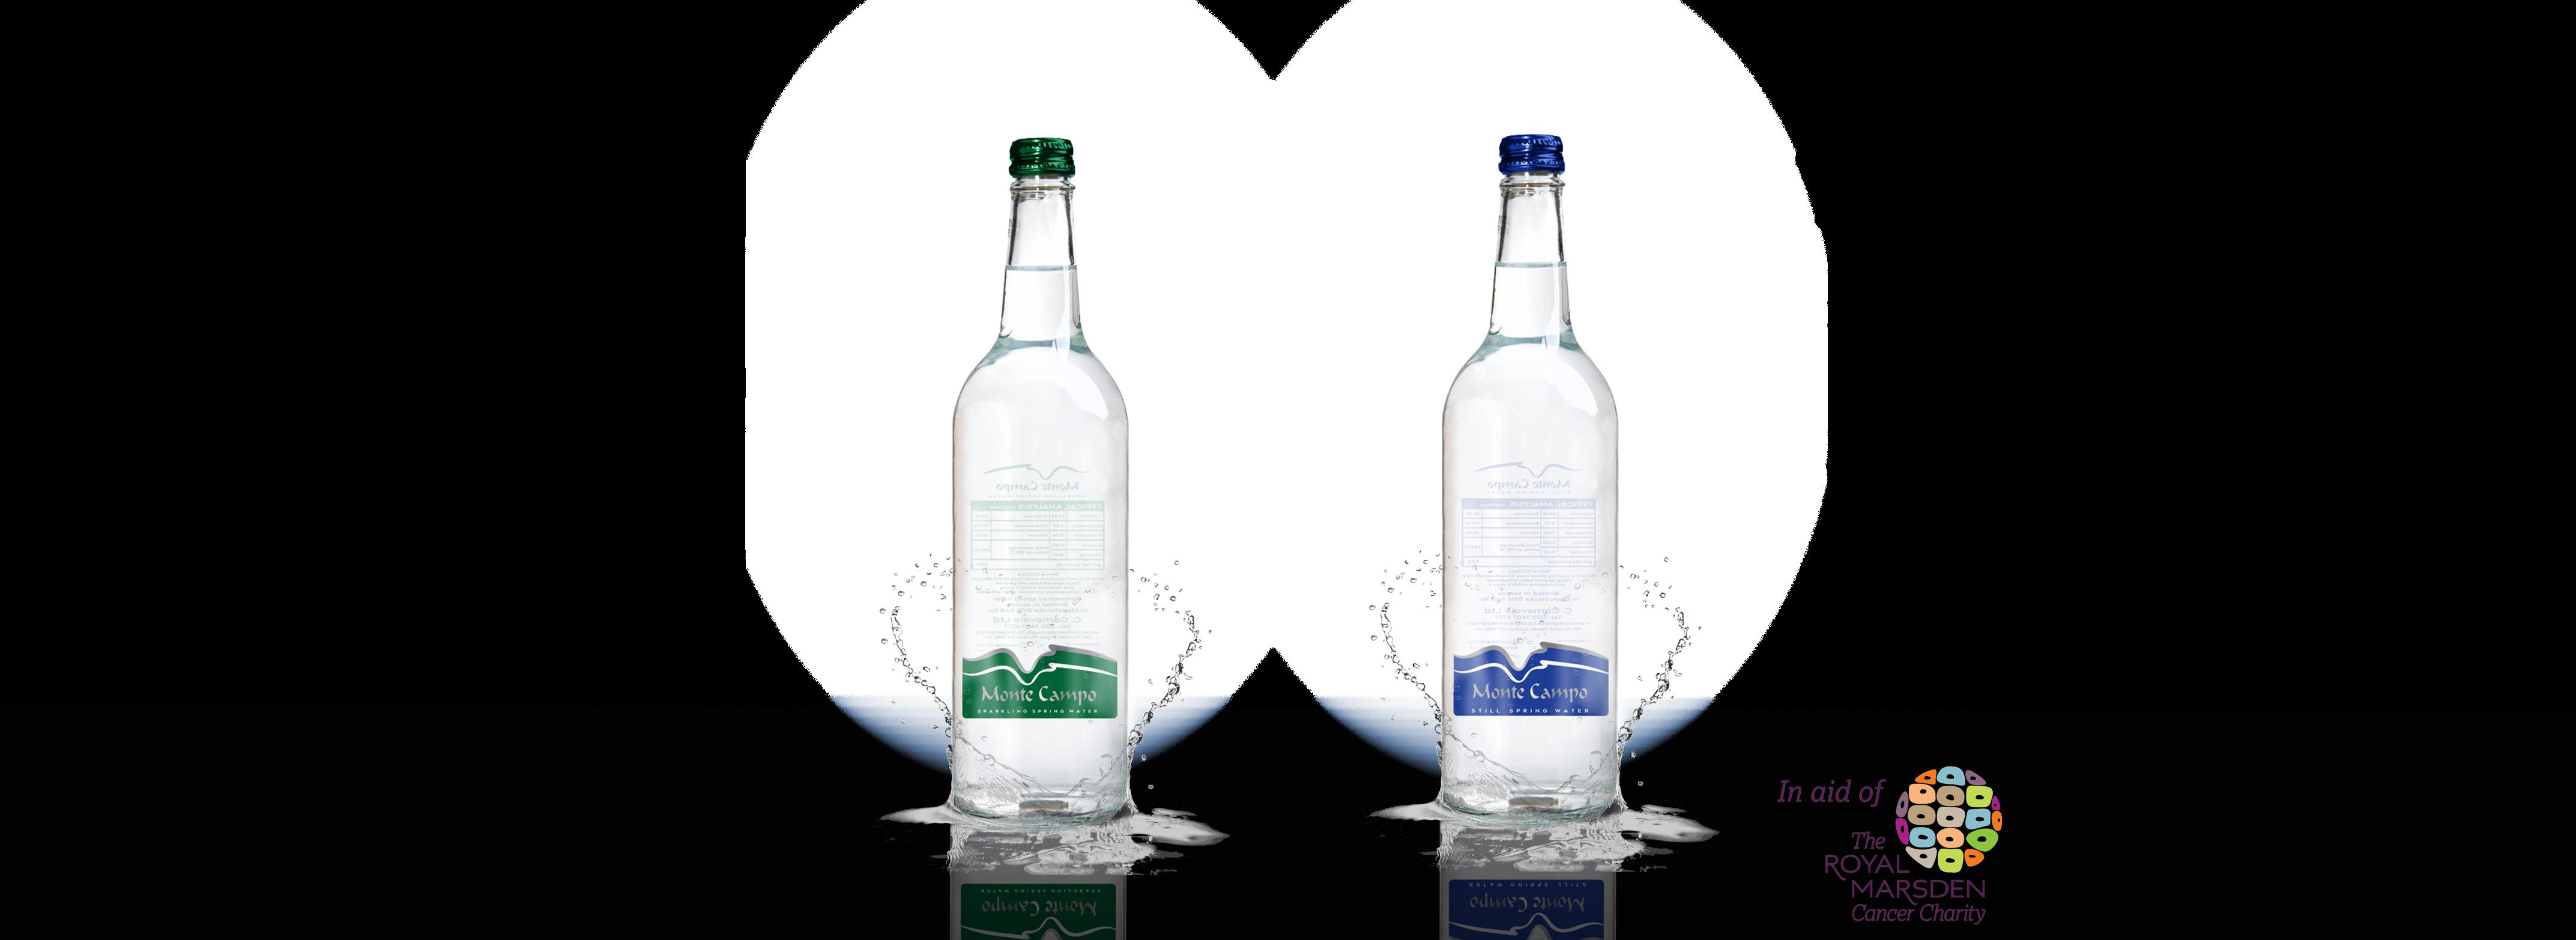 Monte Campo bottles